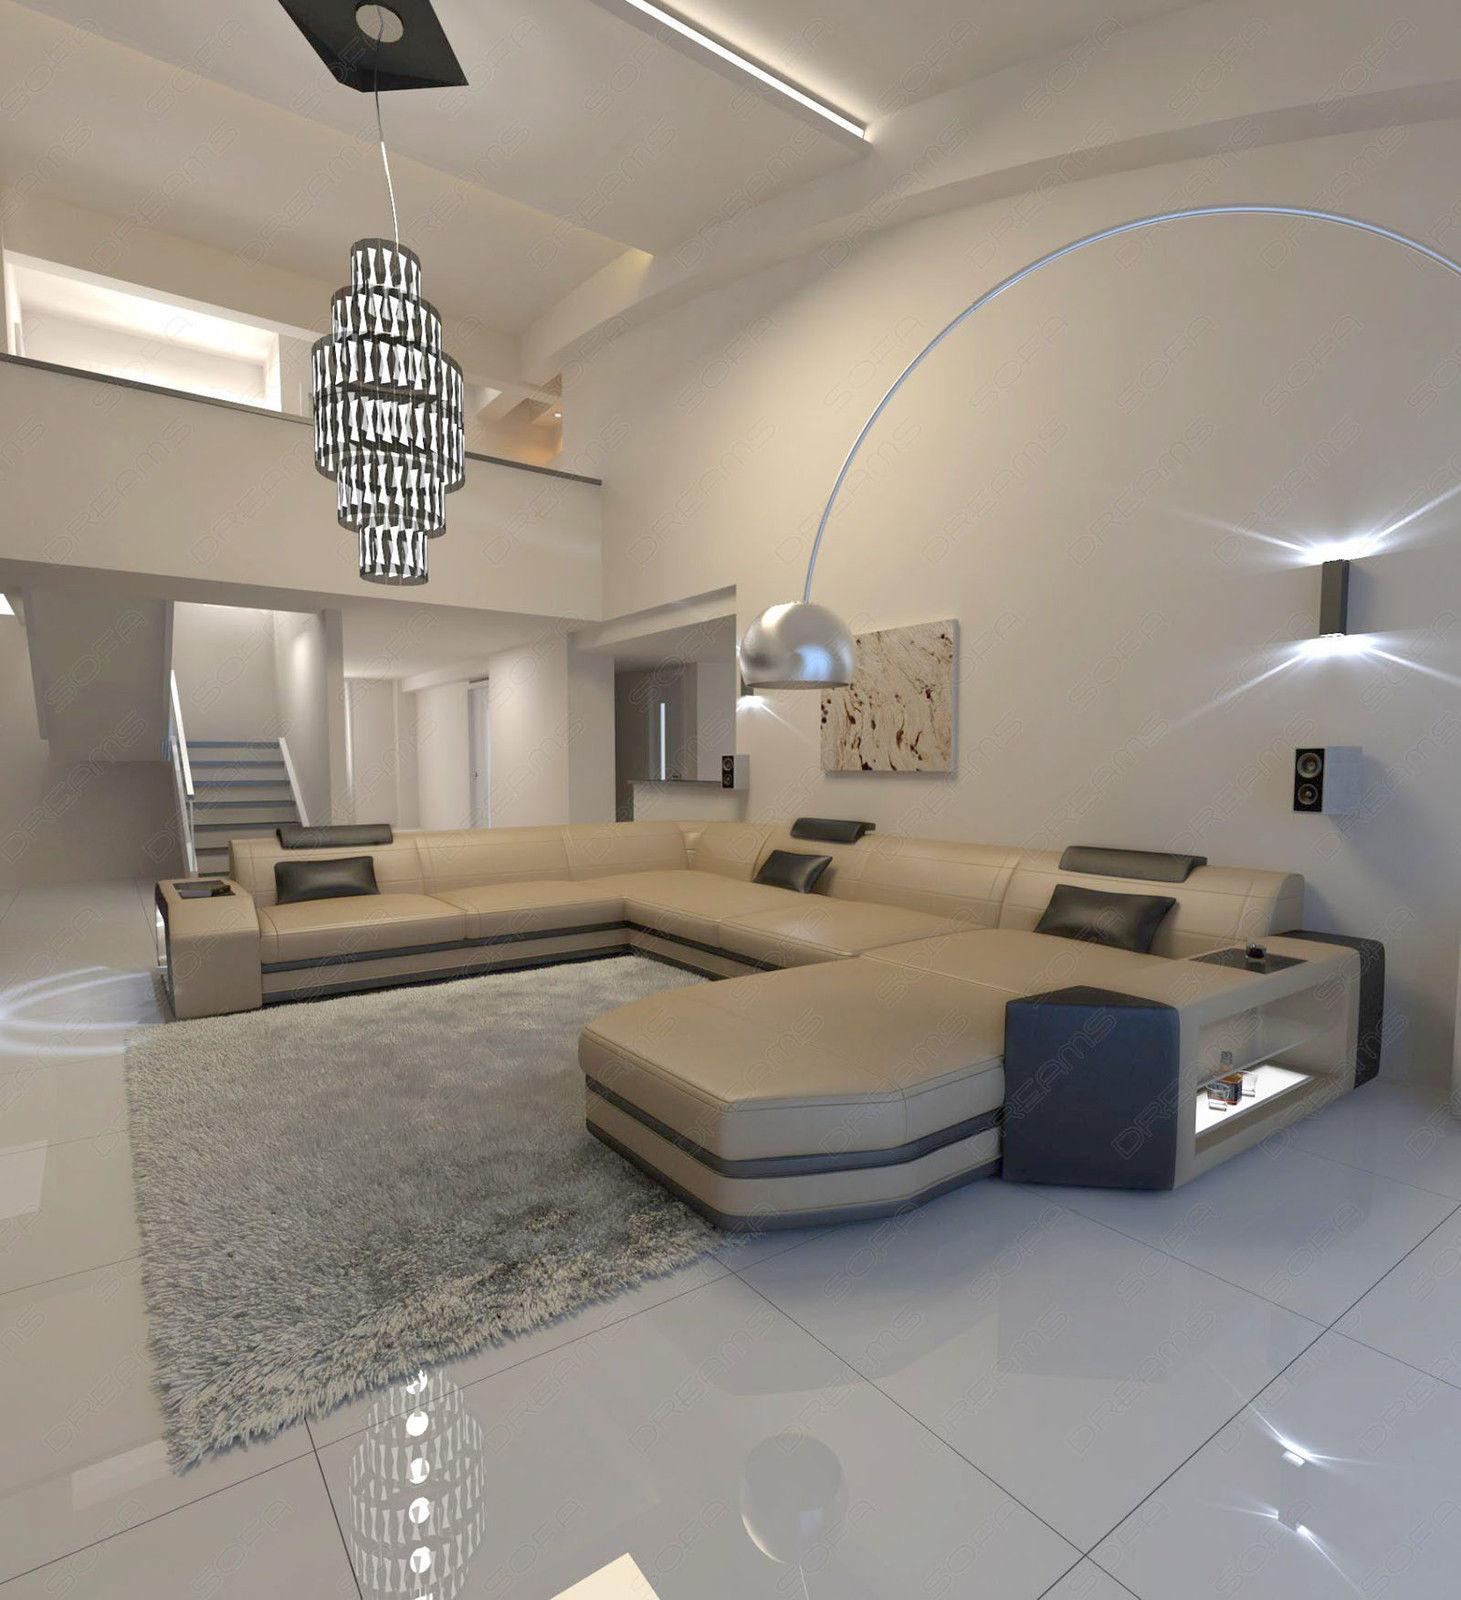 grtes mbelhaus deutschland free beautiful gallery of finest congress centrum oberhausen bild. Black Bedroom Furniture Sets. Home Design Ideas